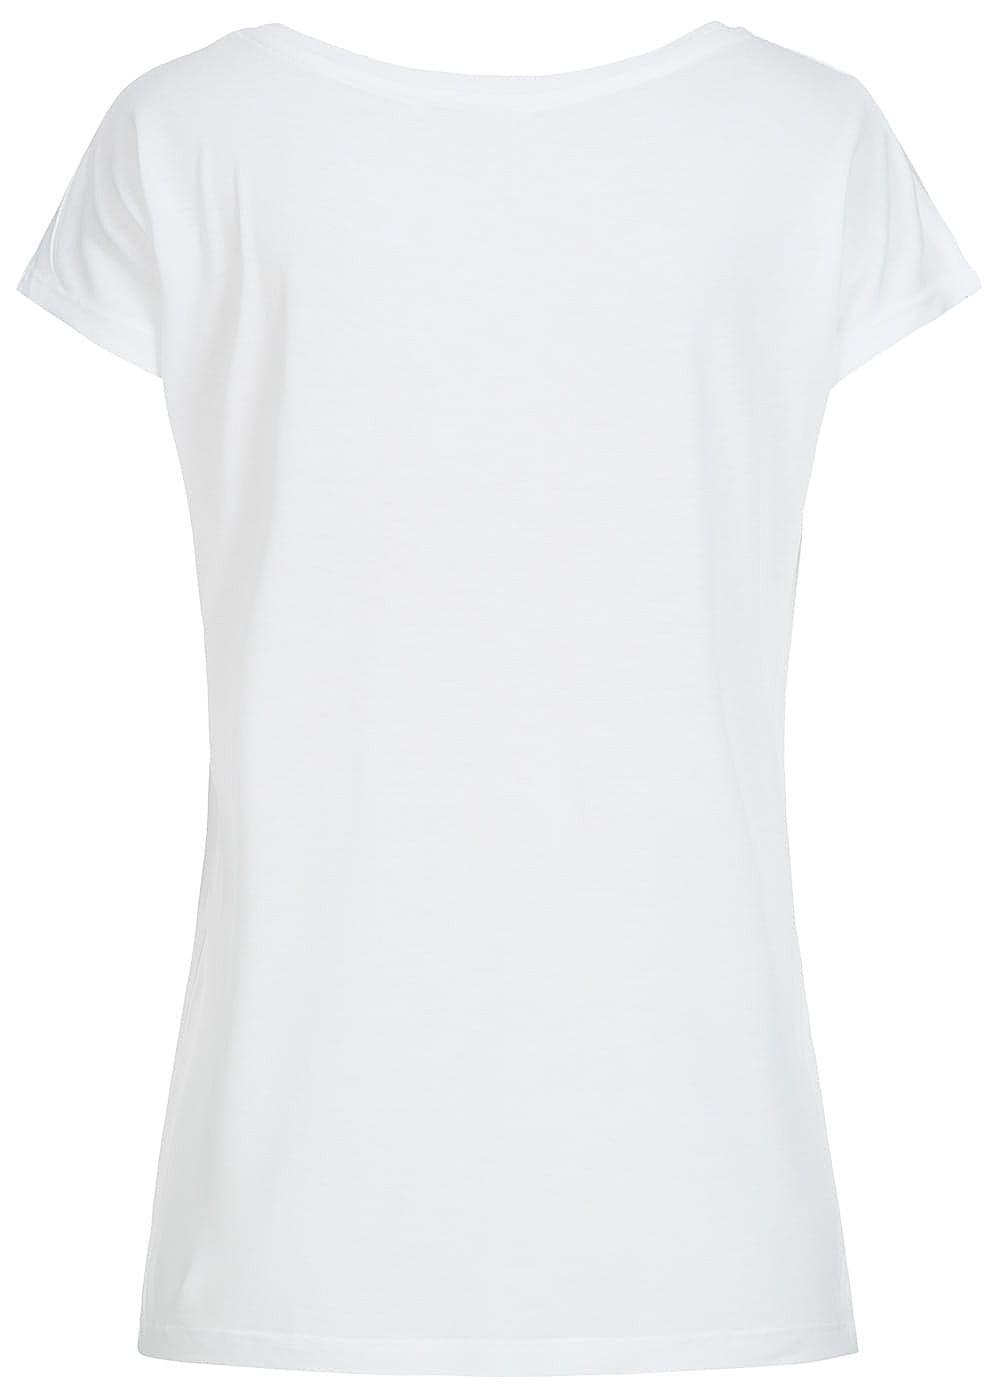 eight2nine damen t shirt rosen patch by fresh made weiss. Black Bedroom Furniture Sets. Home Design Ideas